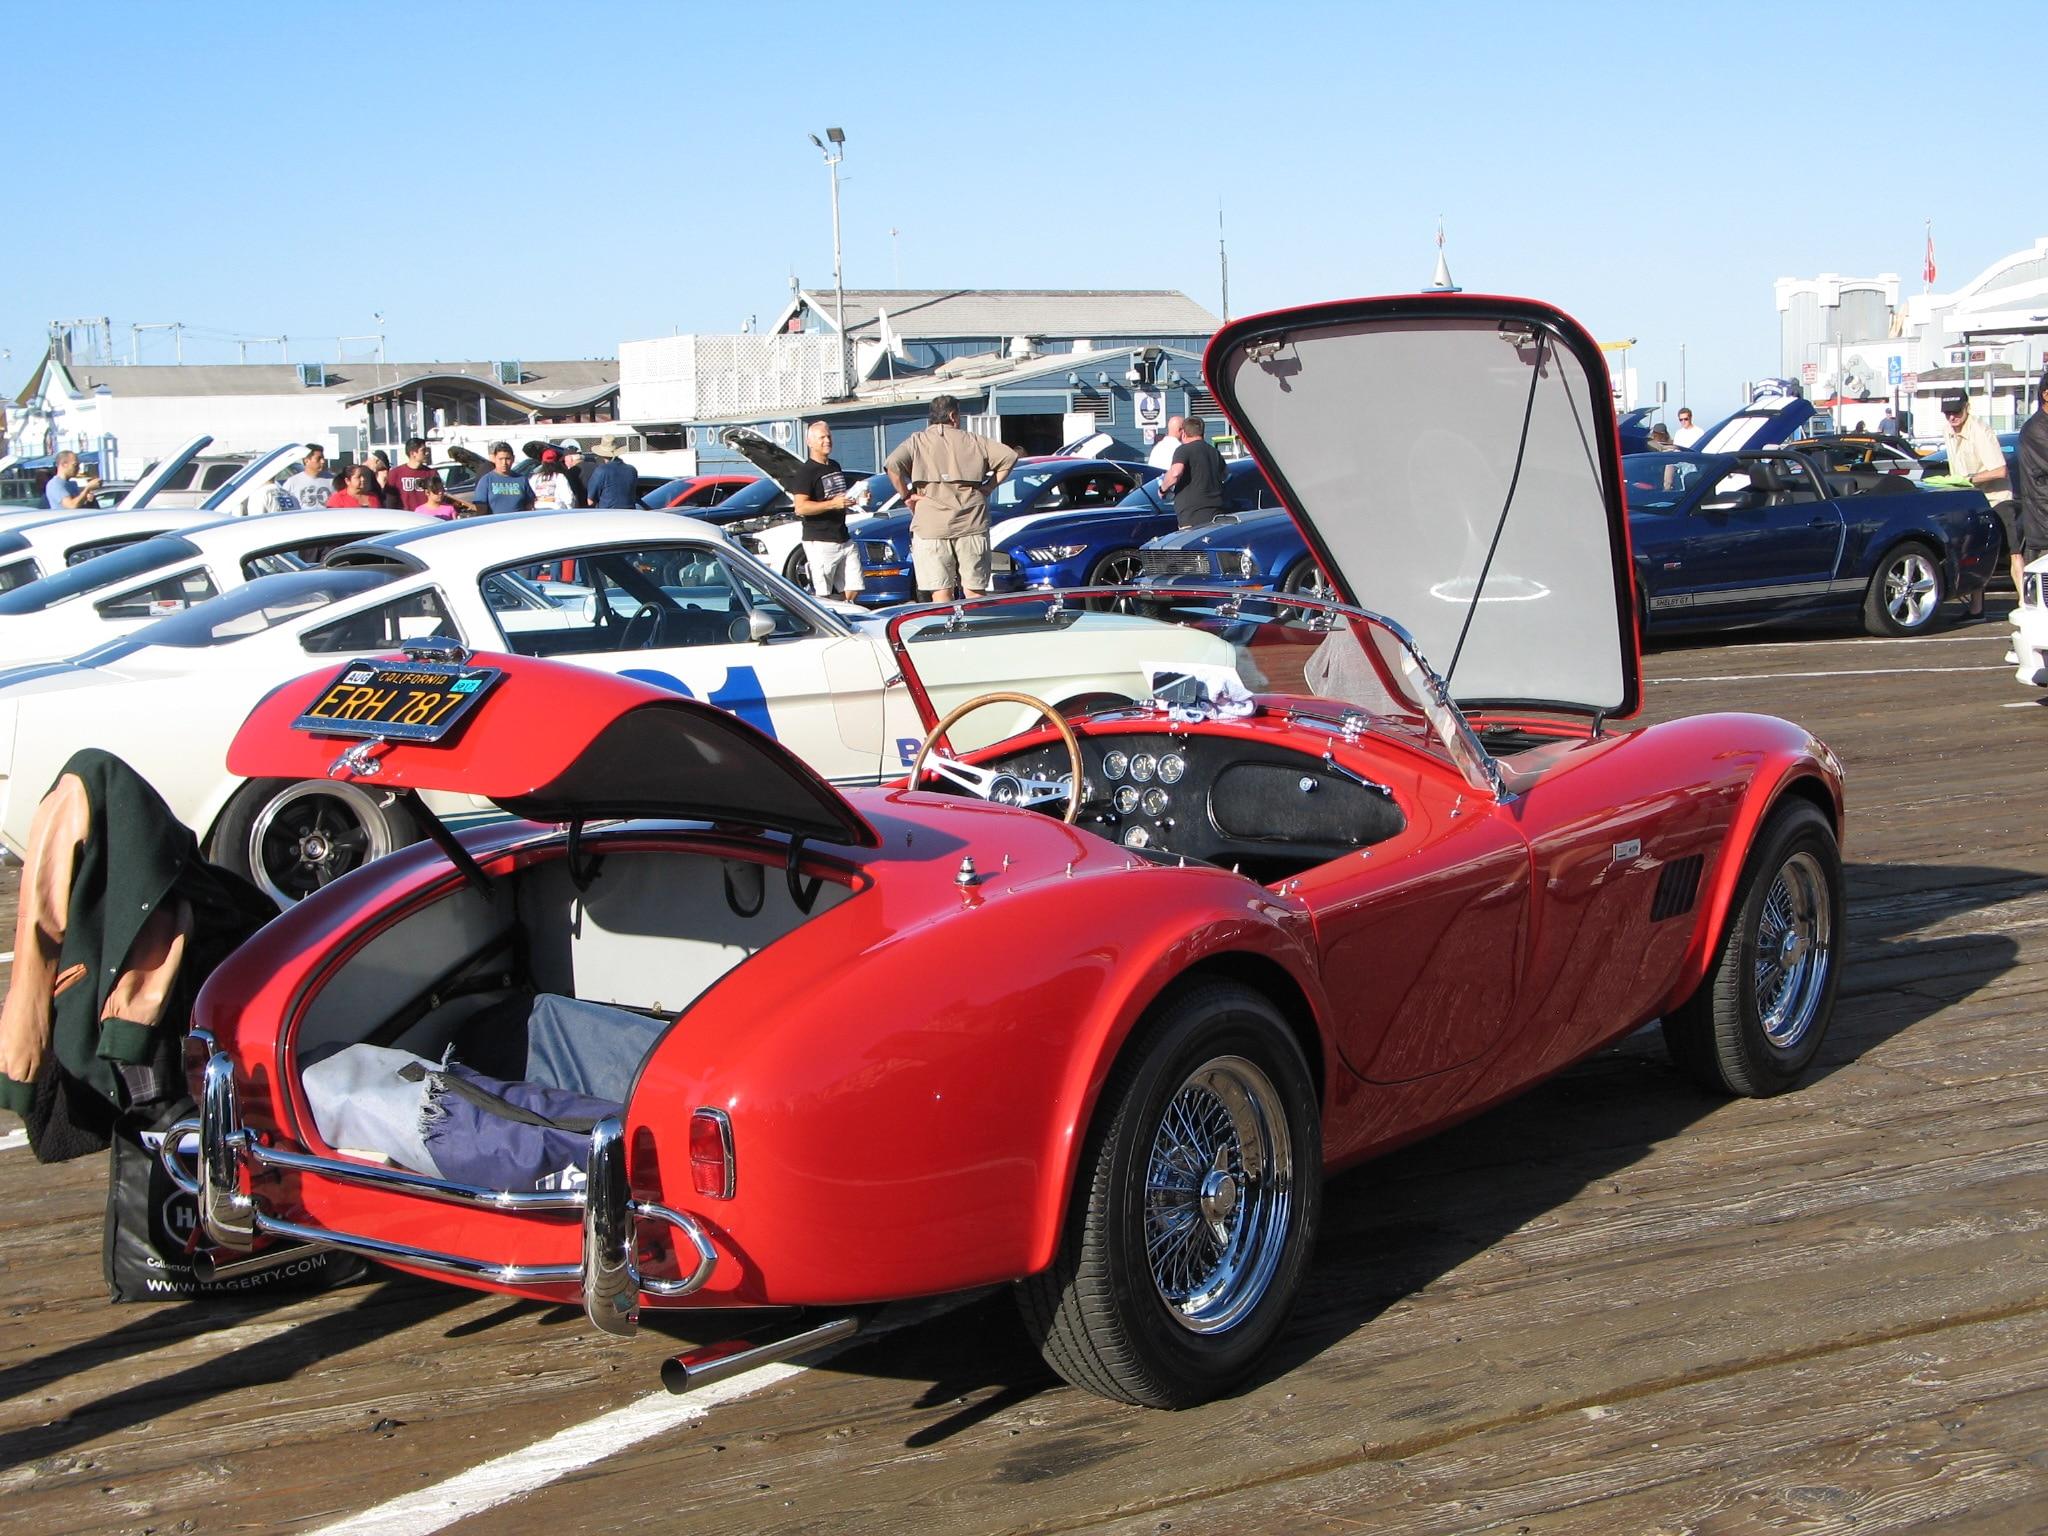 2016 Shelbys On Santa Monica Pier Lasaac 32